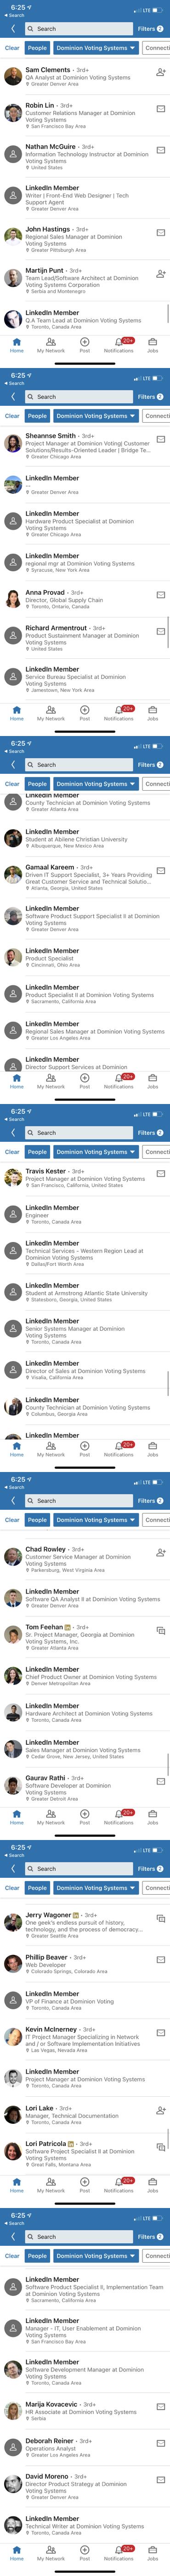 Dominion Employees LinkedIn 2